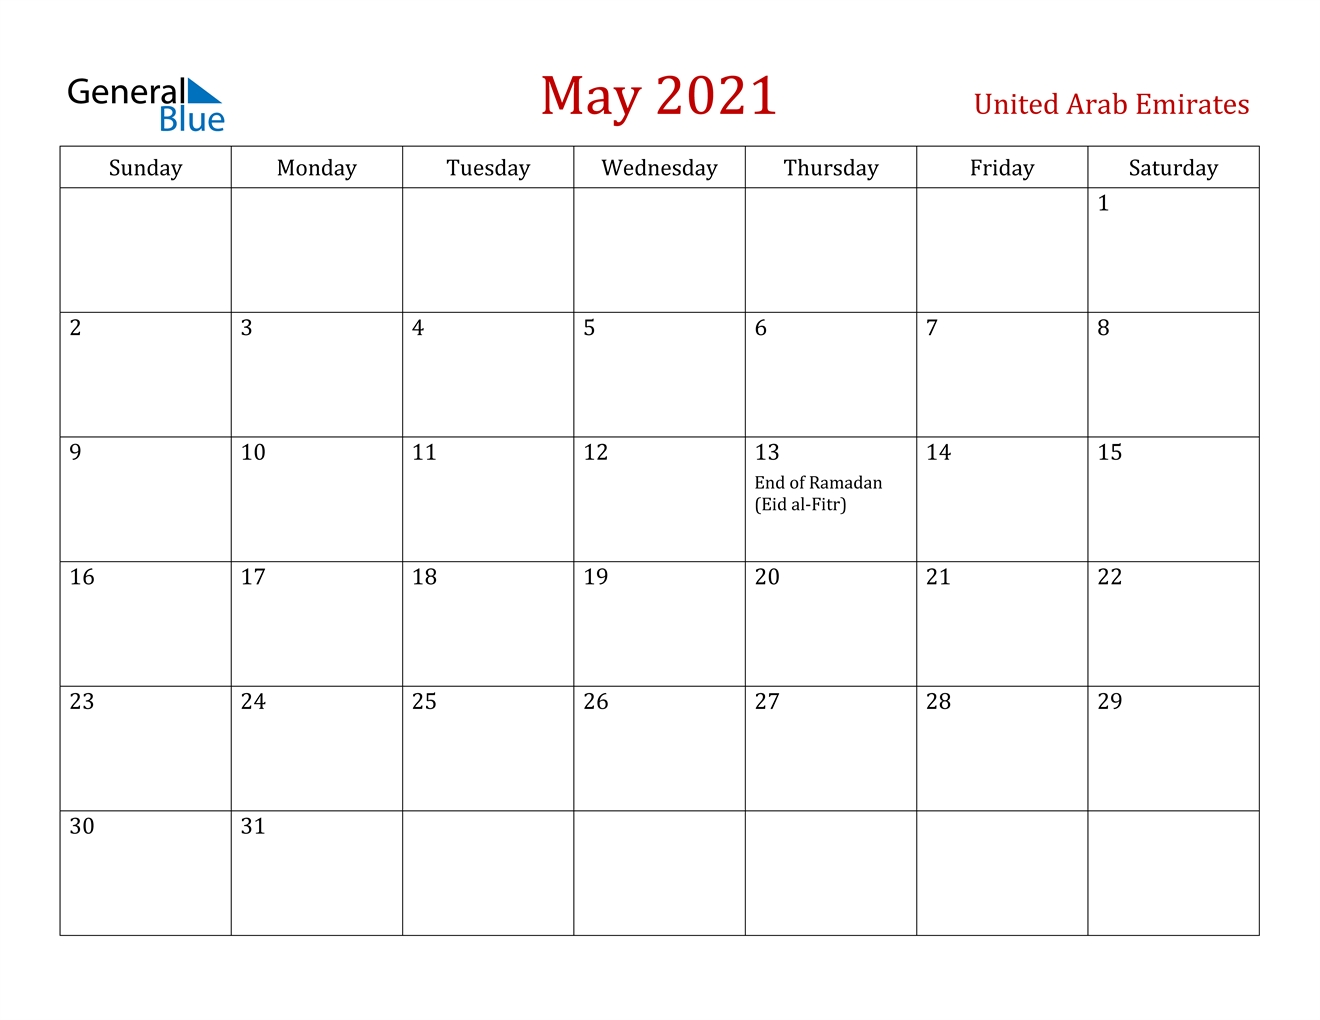 May 2021 Calendar - United Arab Emirates